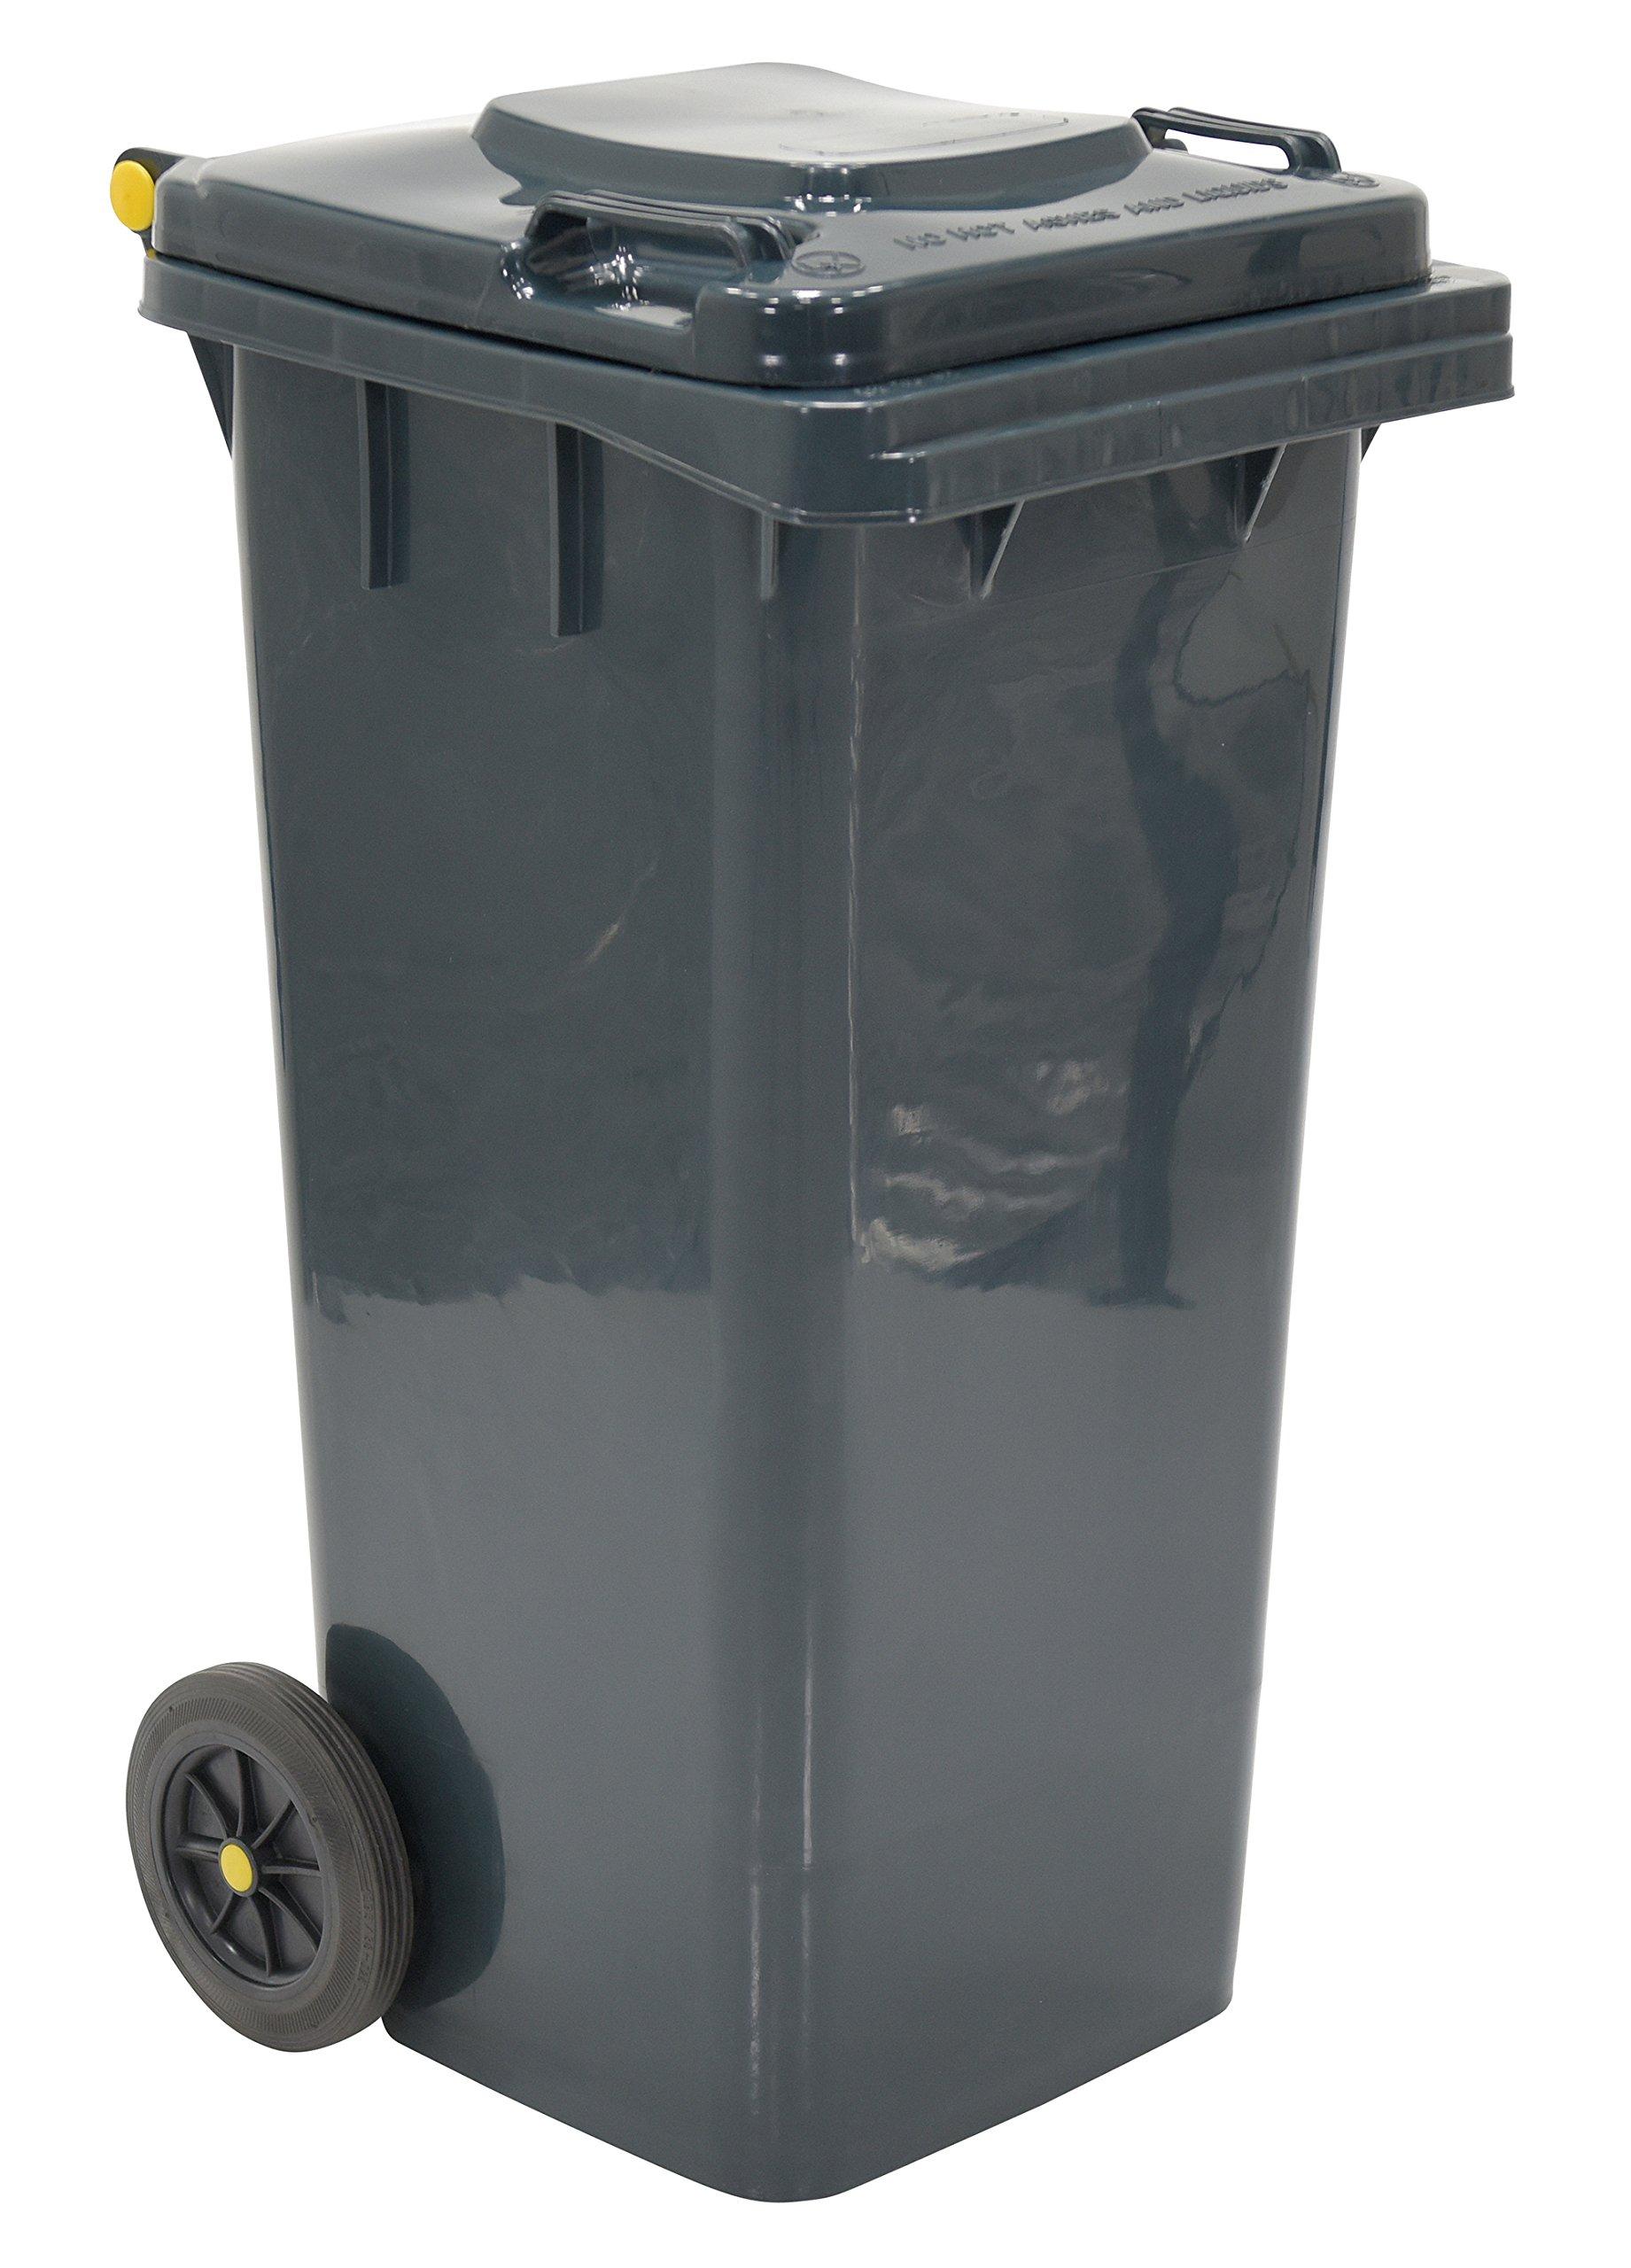 Vestil TH-32-GY Polyethylene 32-Gallon Trash Can, 22'' Length x 37-1/2'' Height, Gray